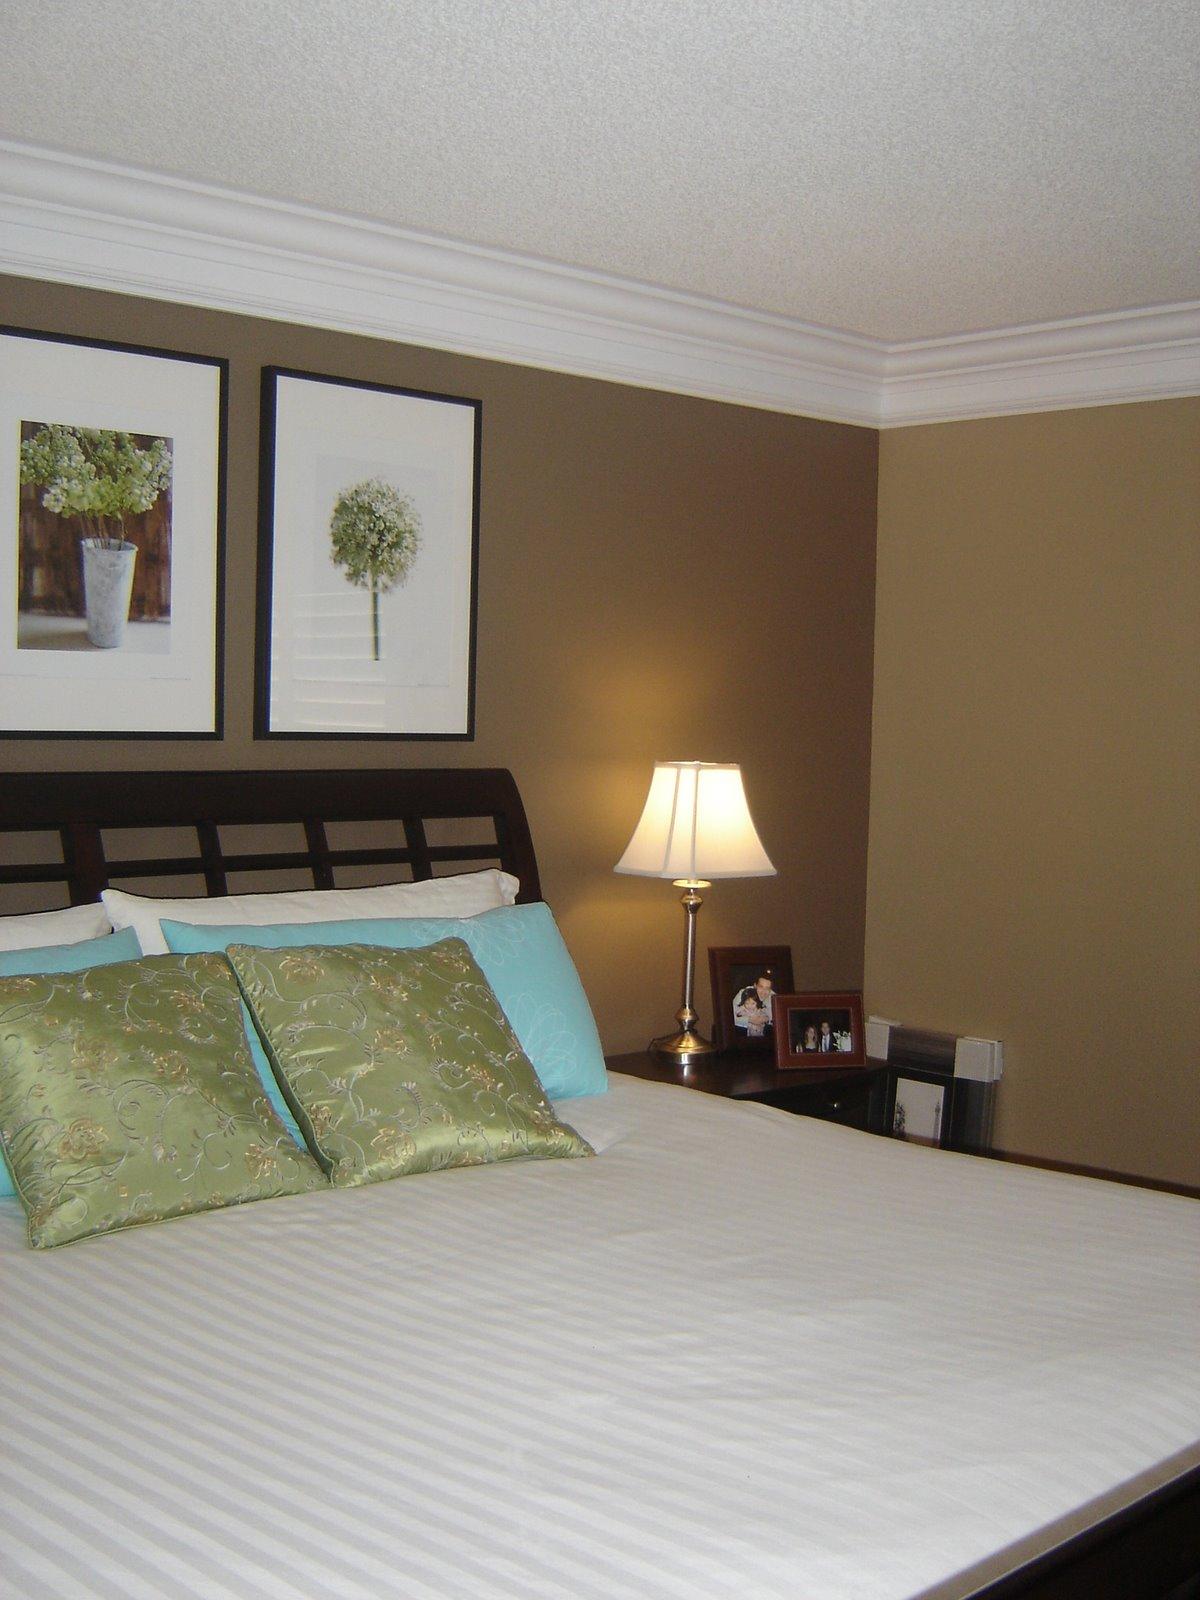 Color For Bedroom Wall Devine Interiors inside measurements 1200 X 1600